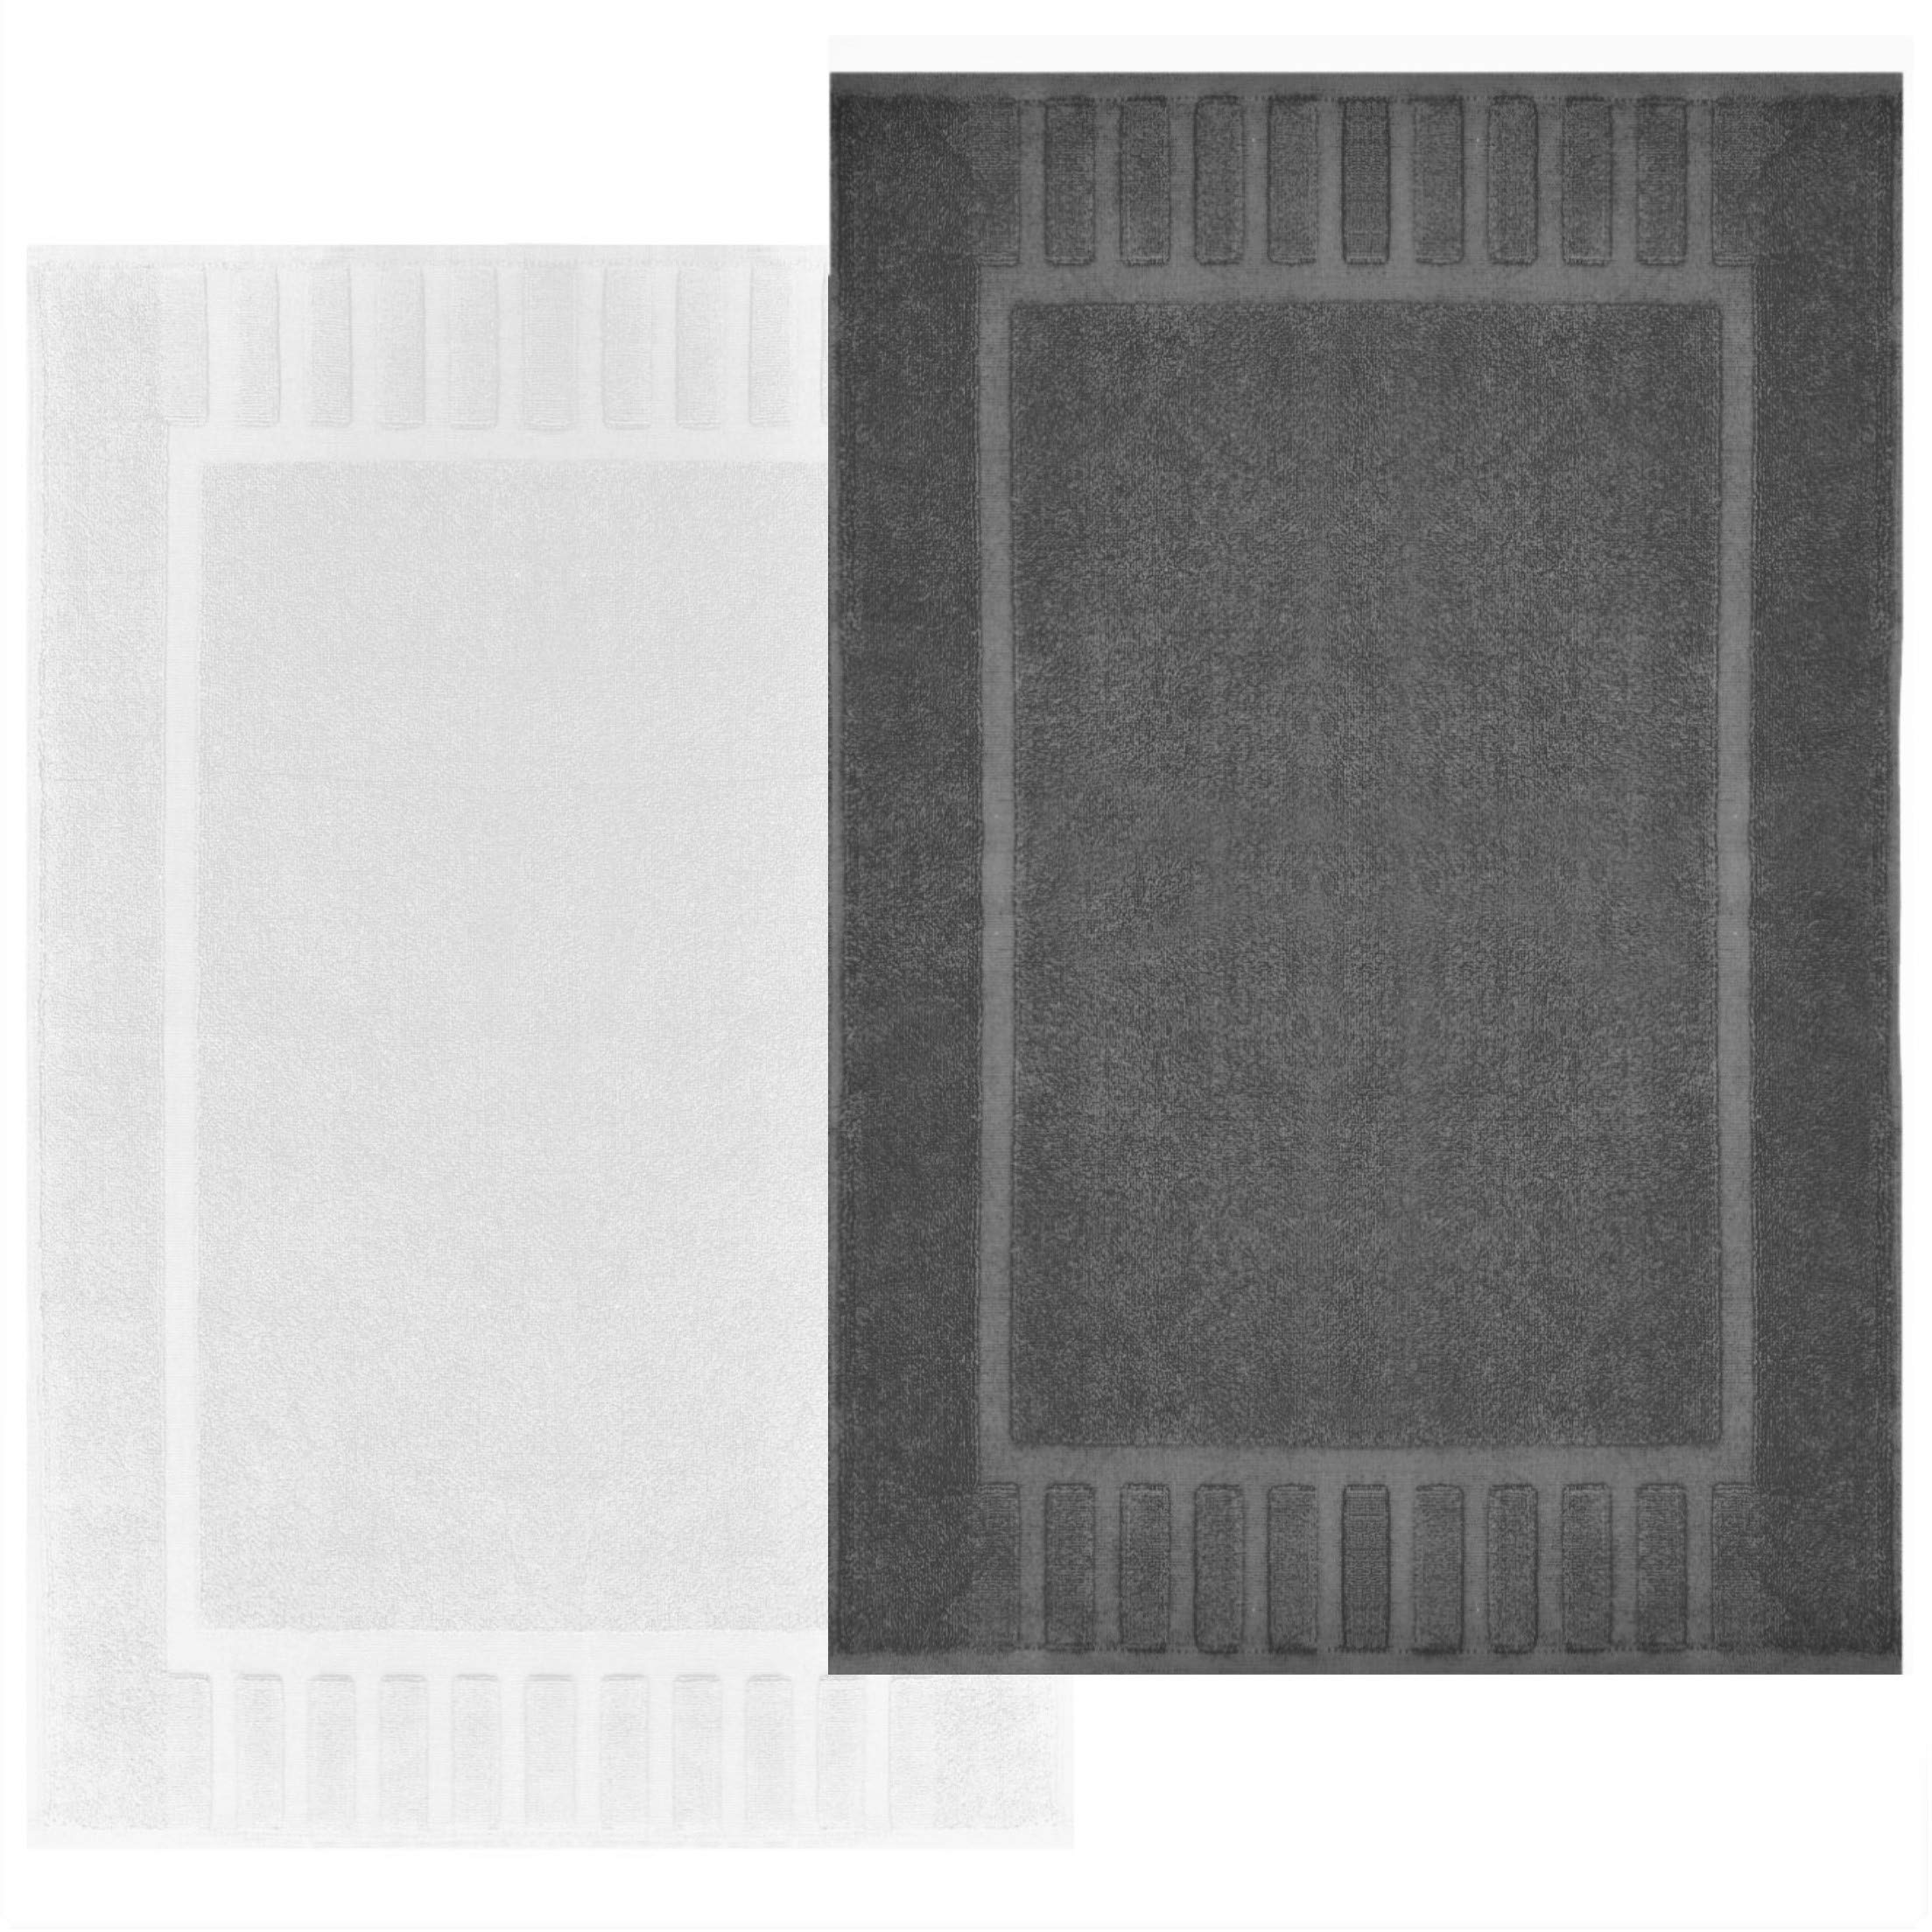 "White Classic Luxury Bath Mat Floor Towel Set - Absorbent Cotton Hotel Spa Shower/Bathtub Mats [Not a Bathroom Rug] 22""x34"" | 2 Pack | 1-Grey/1-White"